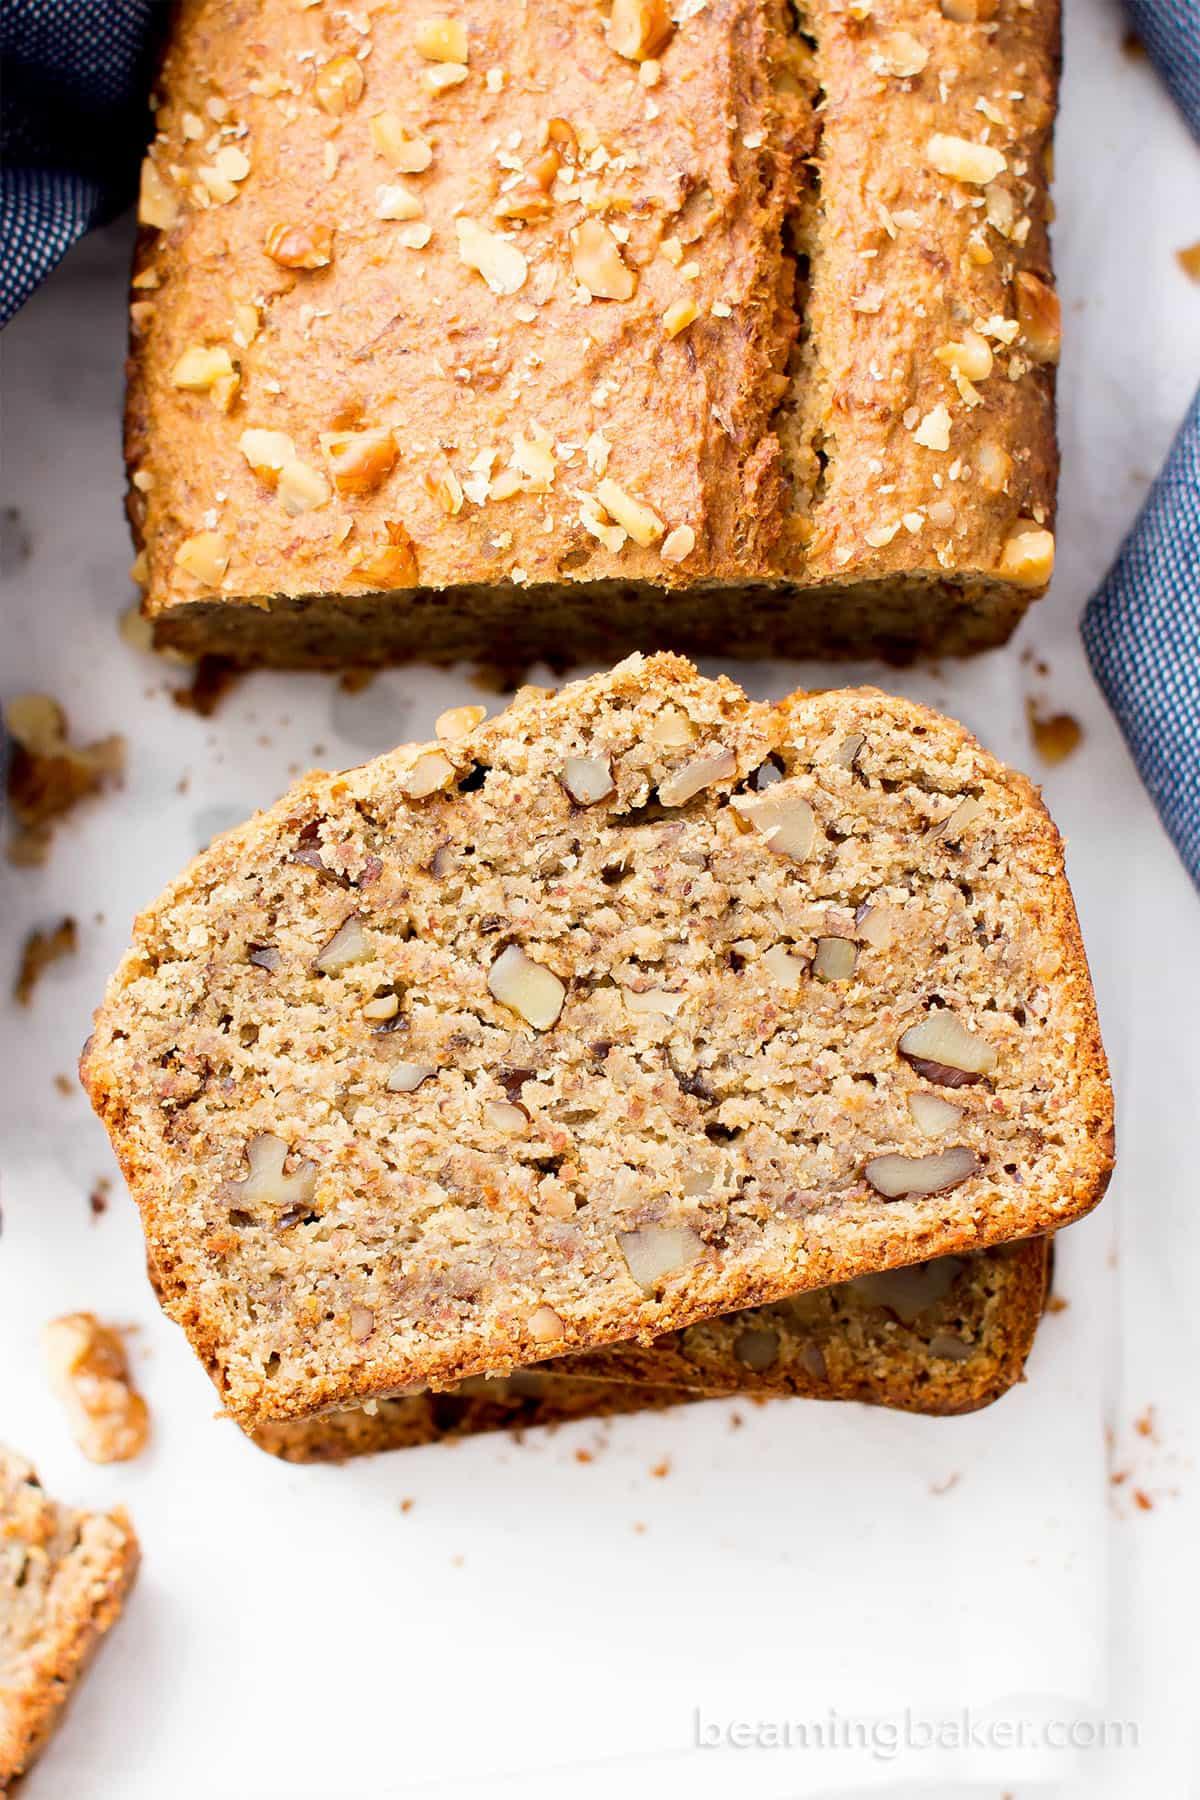 Gluten Free Vegan Bread Recipe  e Bowl Vegan Gluten Free Banana Nut Bread V GF Oat